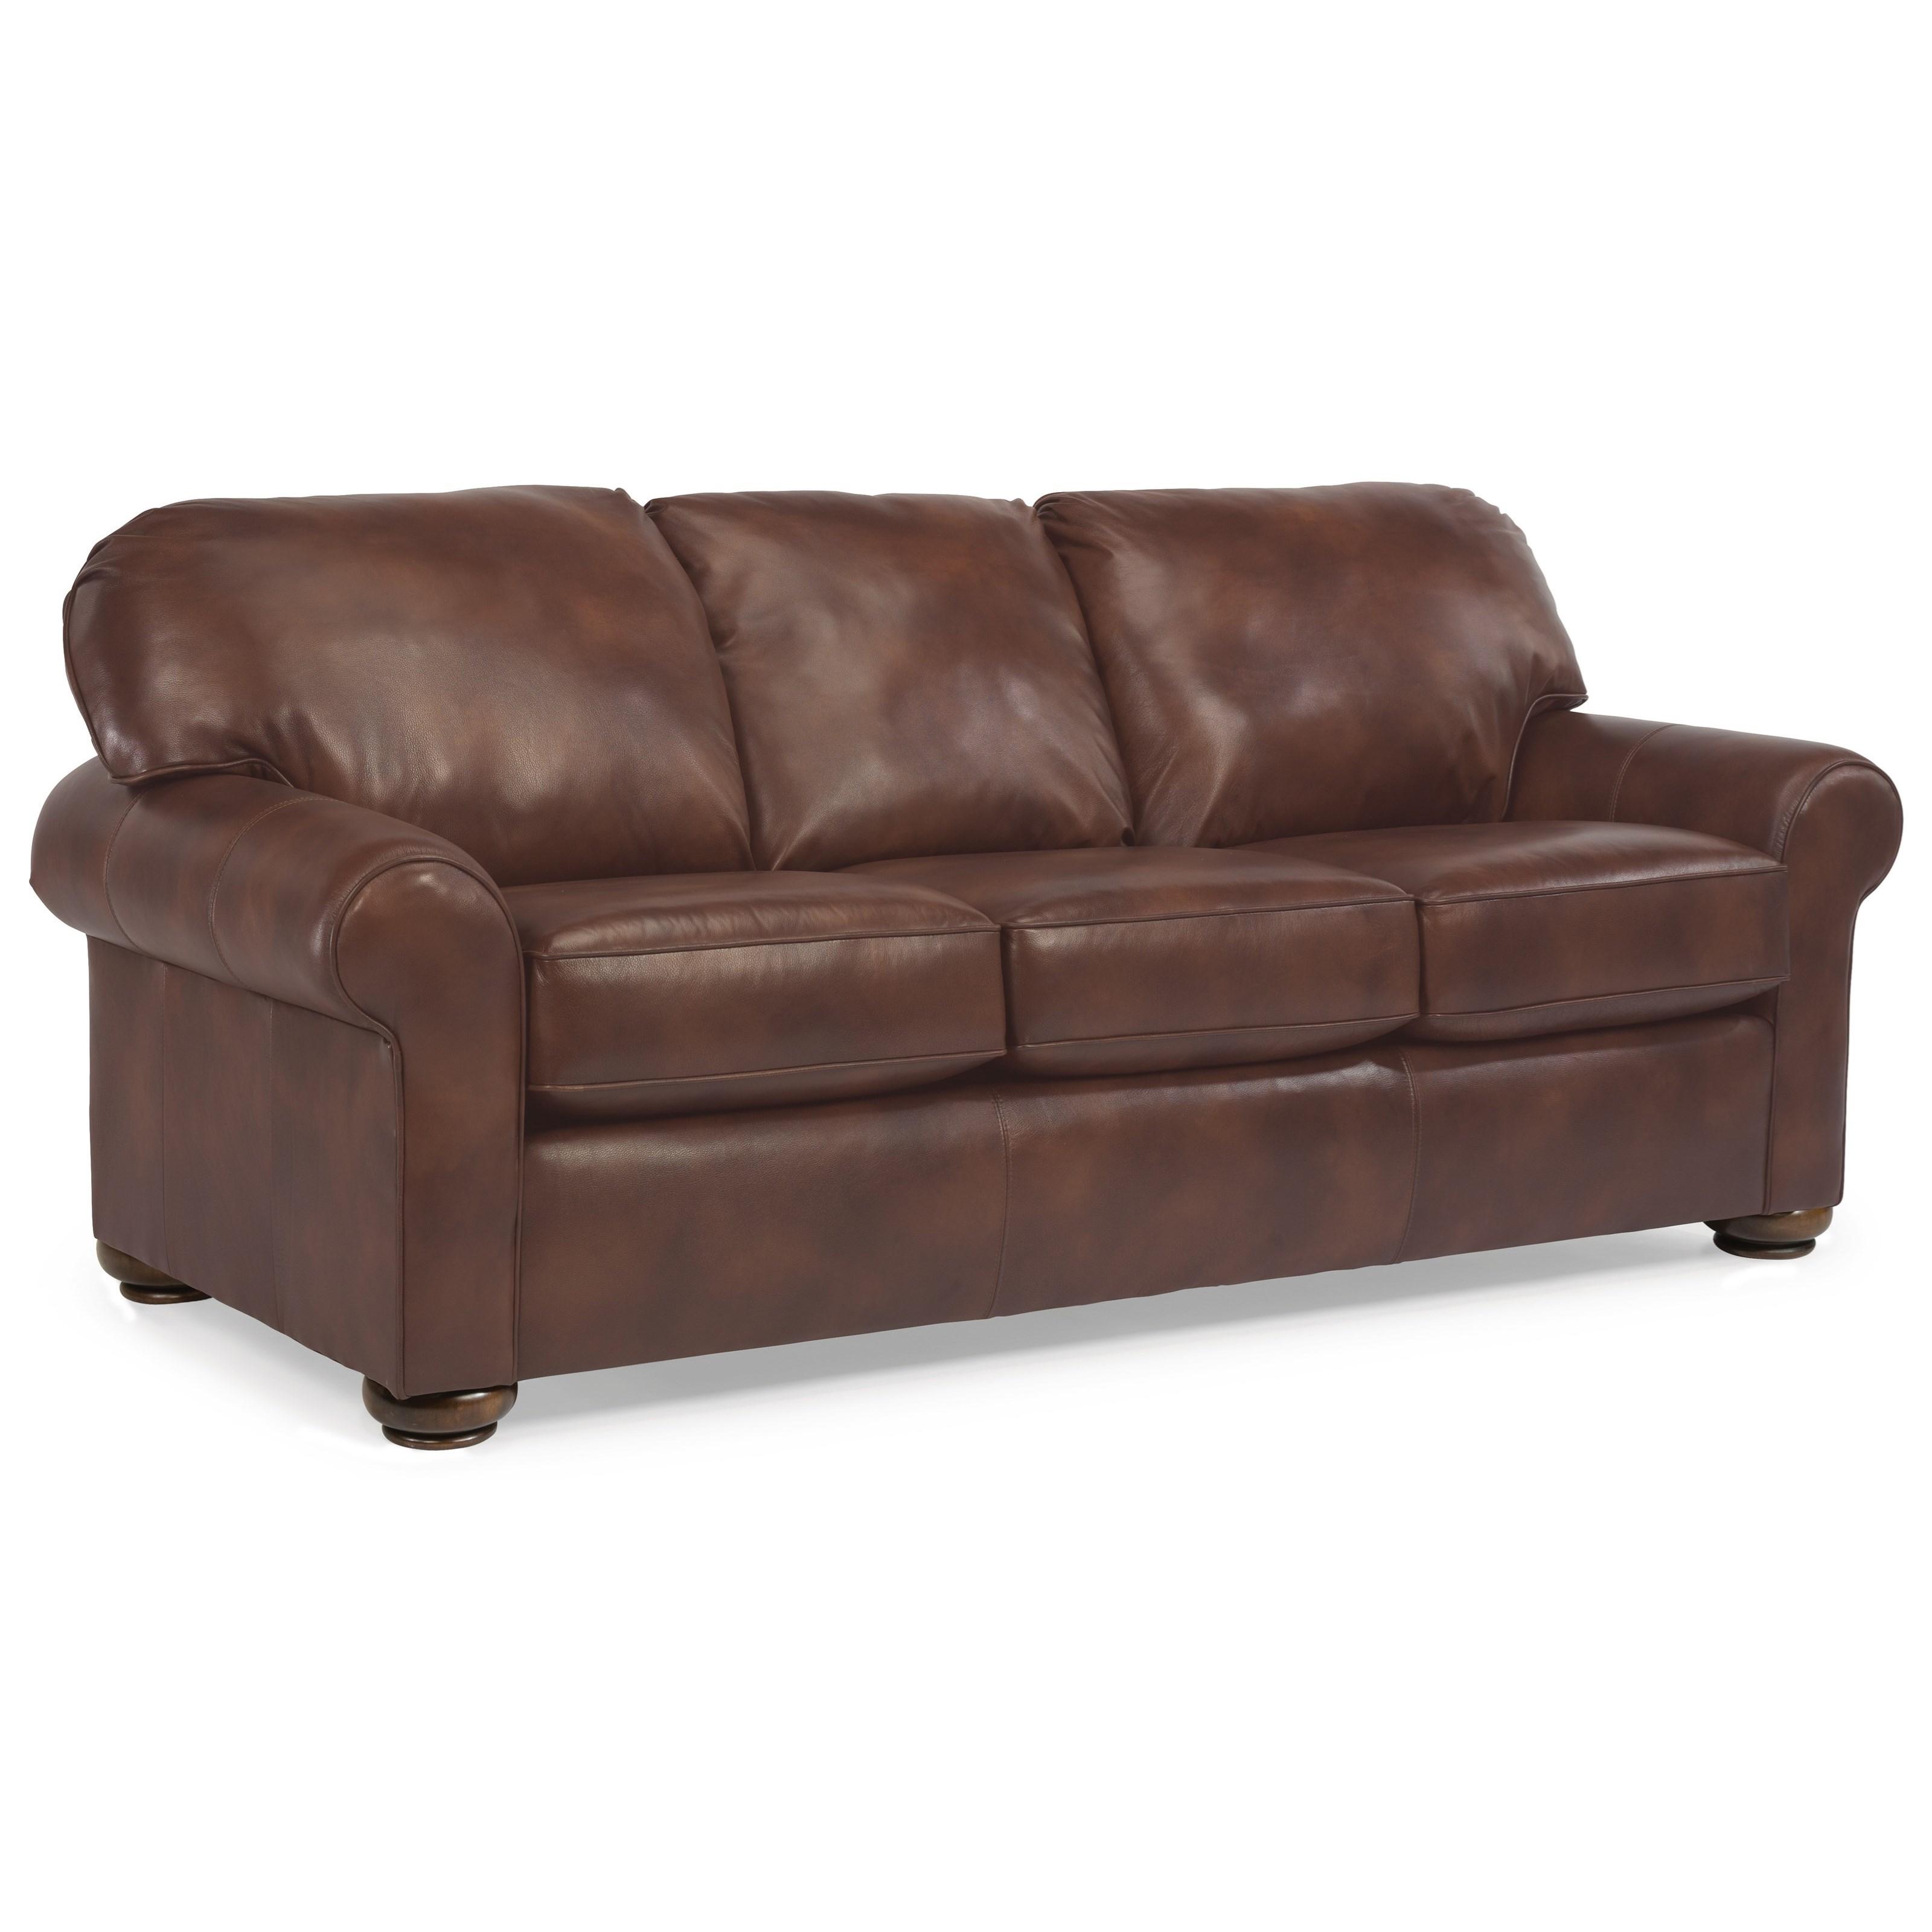 Crowley Furniture